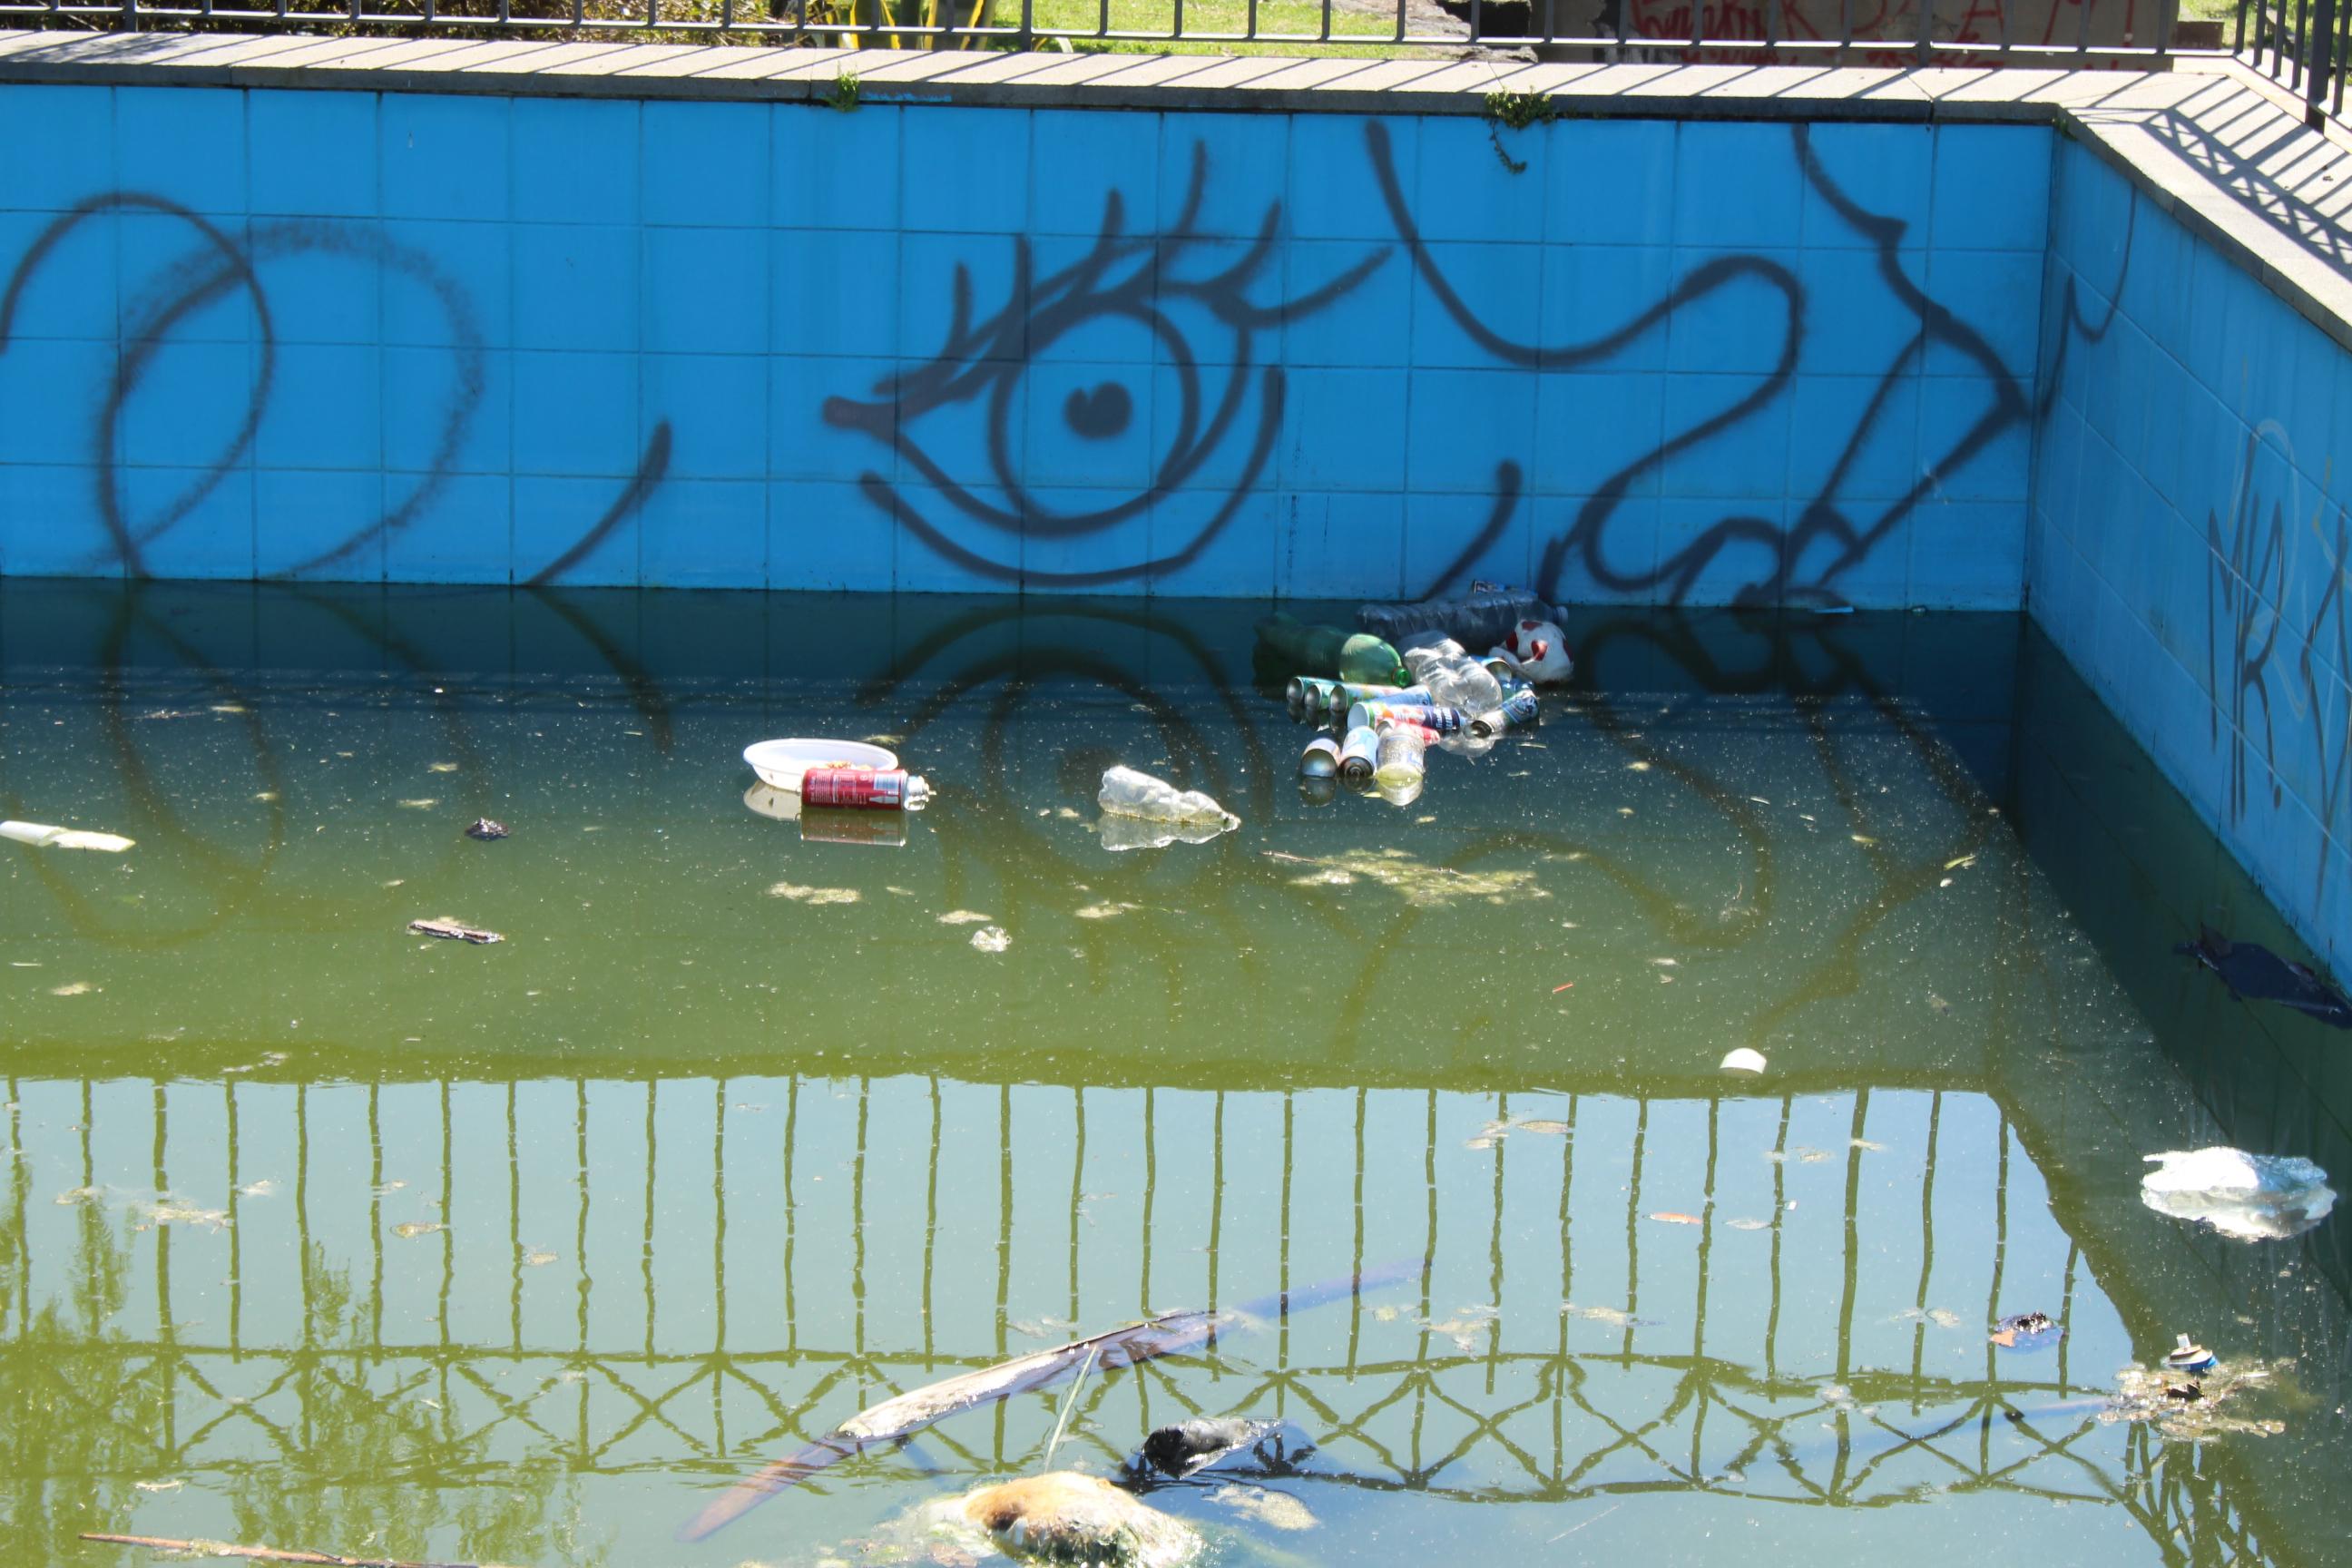 villa comunale - carcasse animali - mascalucia - UltimaTv (1)